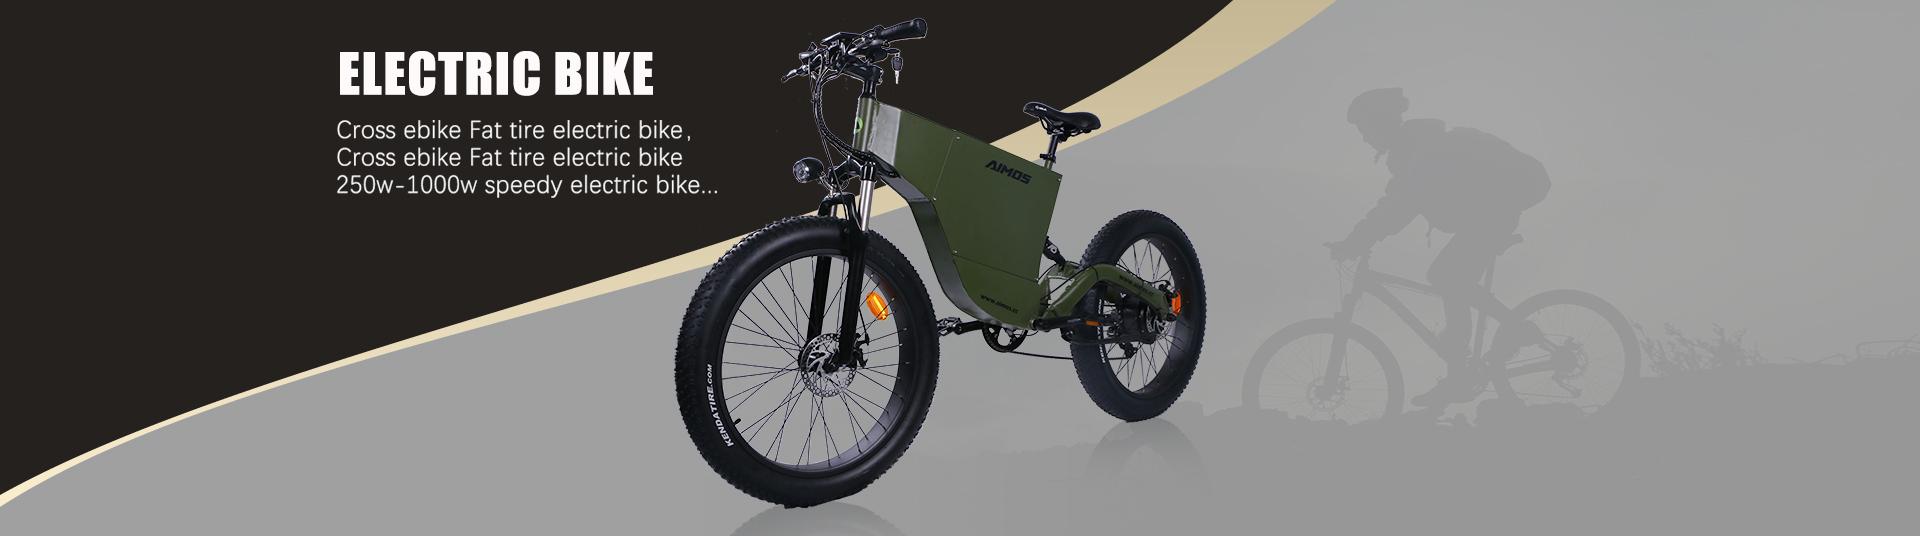 Electric bike contact fuckslut!